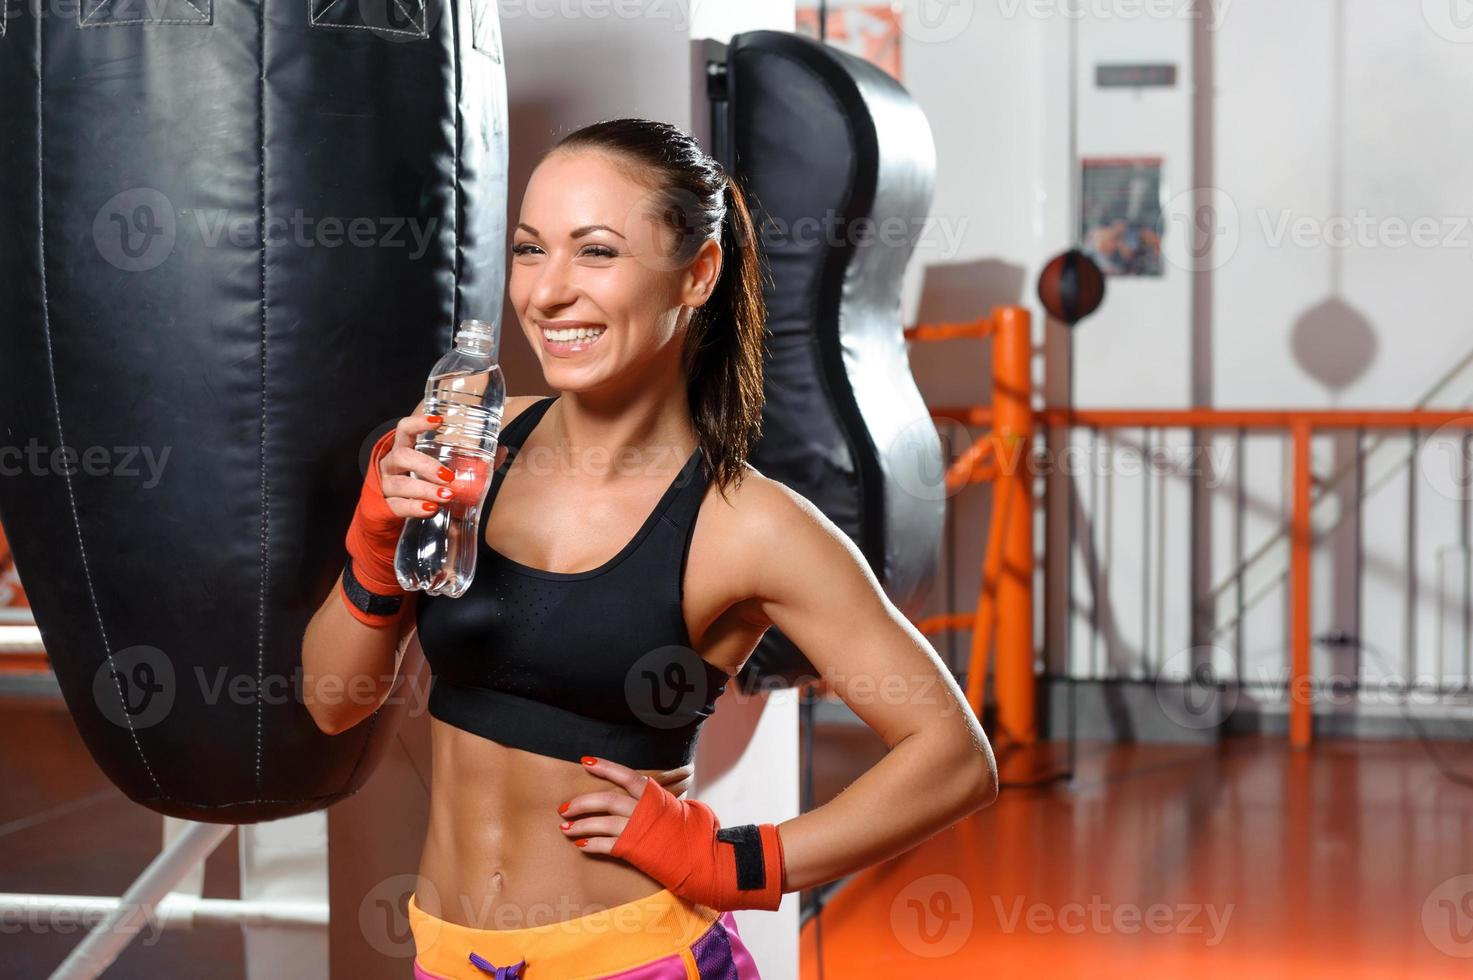 Female kickboxer drinks water photo